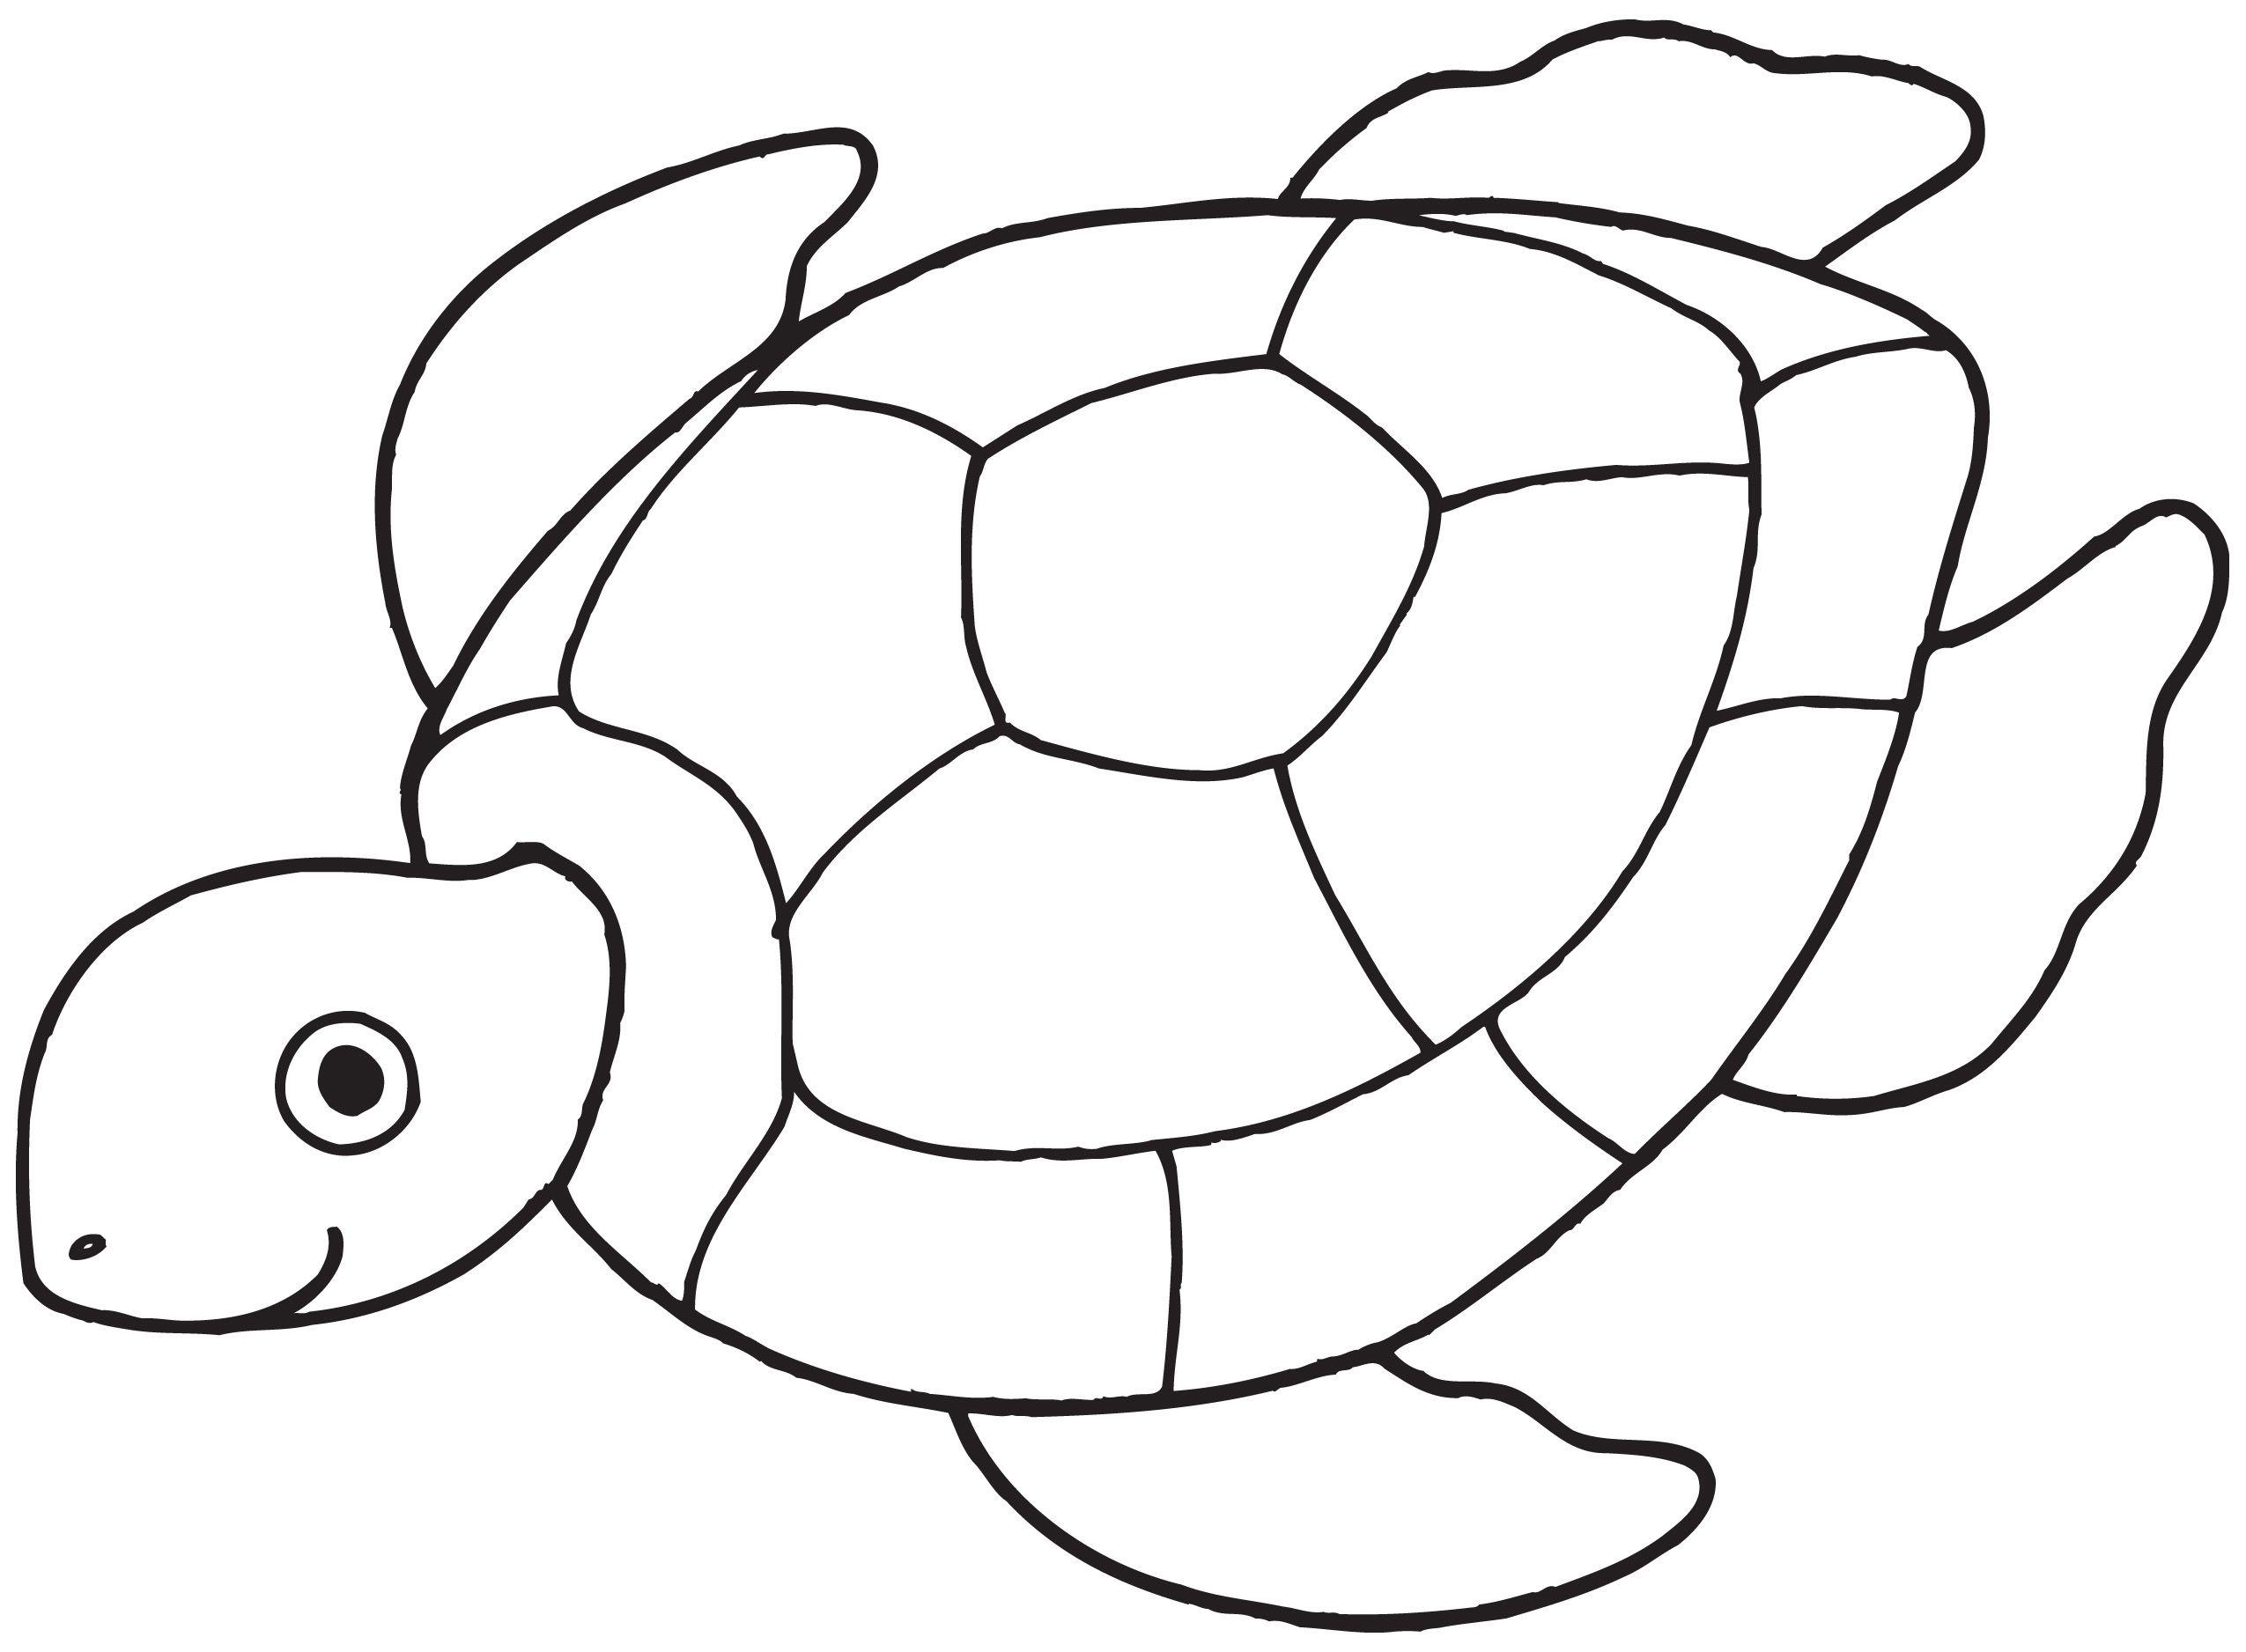 Simple Sea Turtle Drawing Turtle Clip Art Sea Turtle Clip Art Black And White Sea Turtle Coloring Pages Turtle Drawing Sea Turtle Drawing